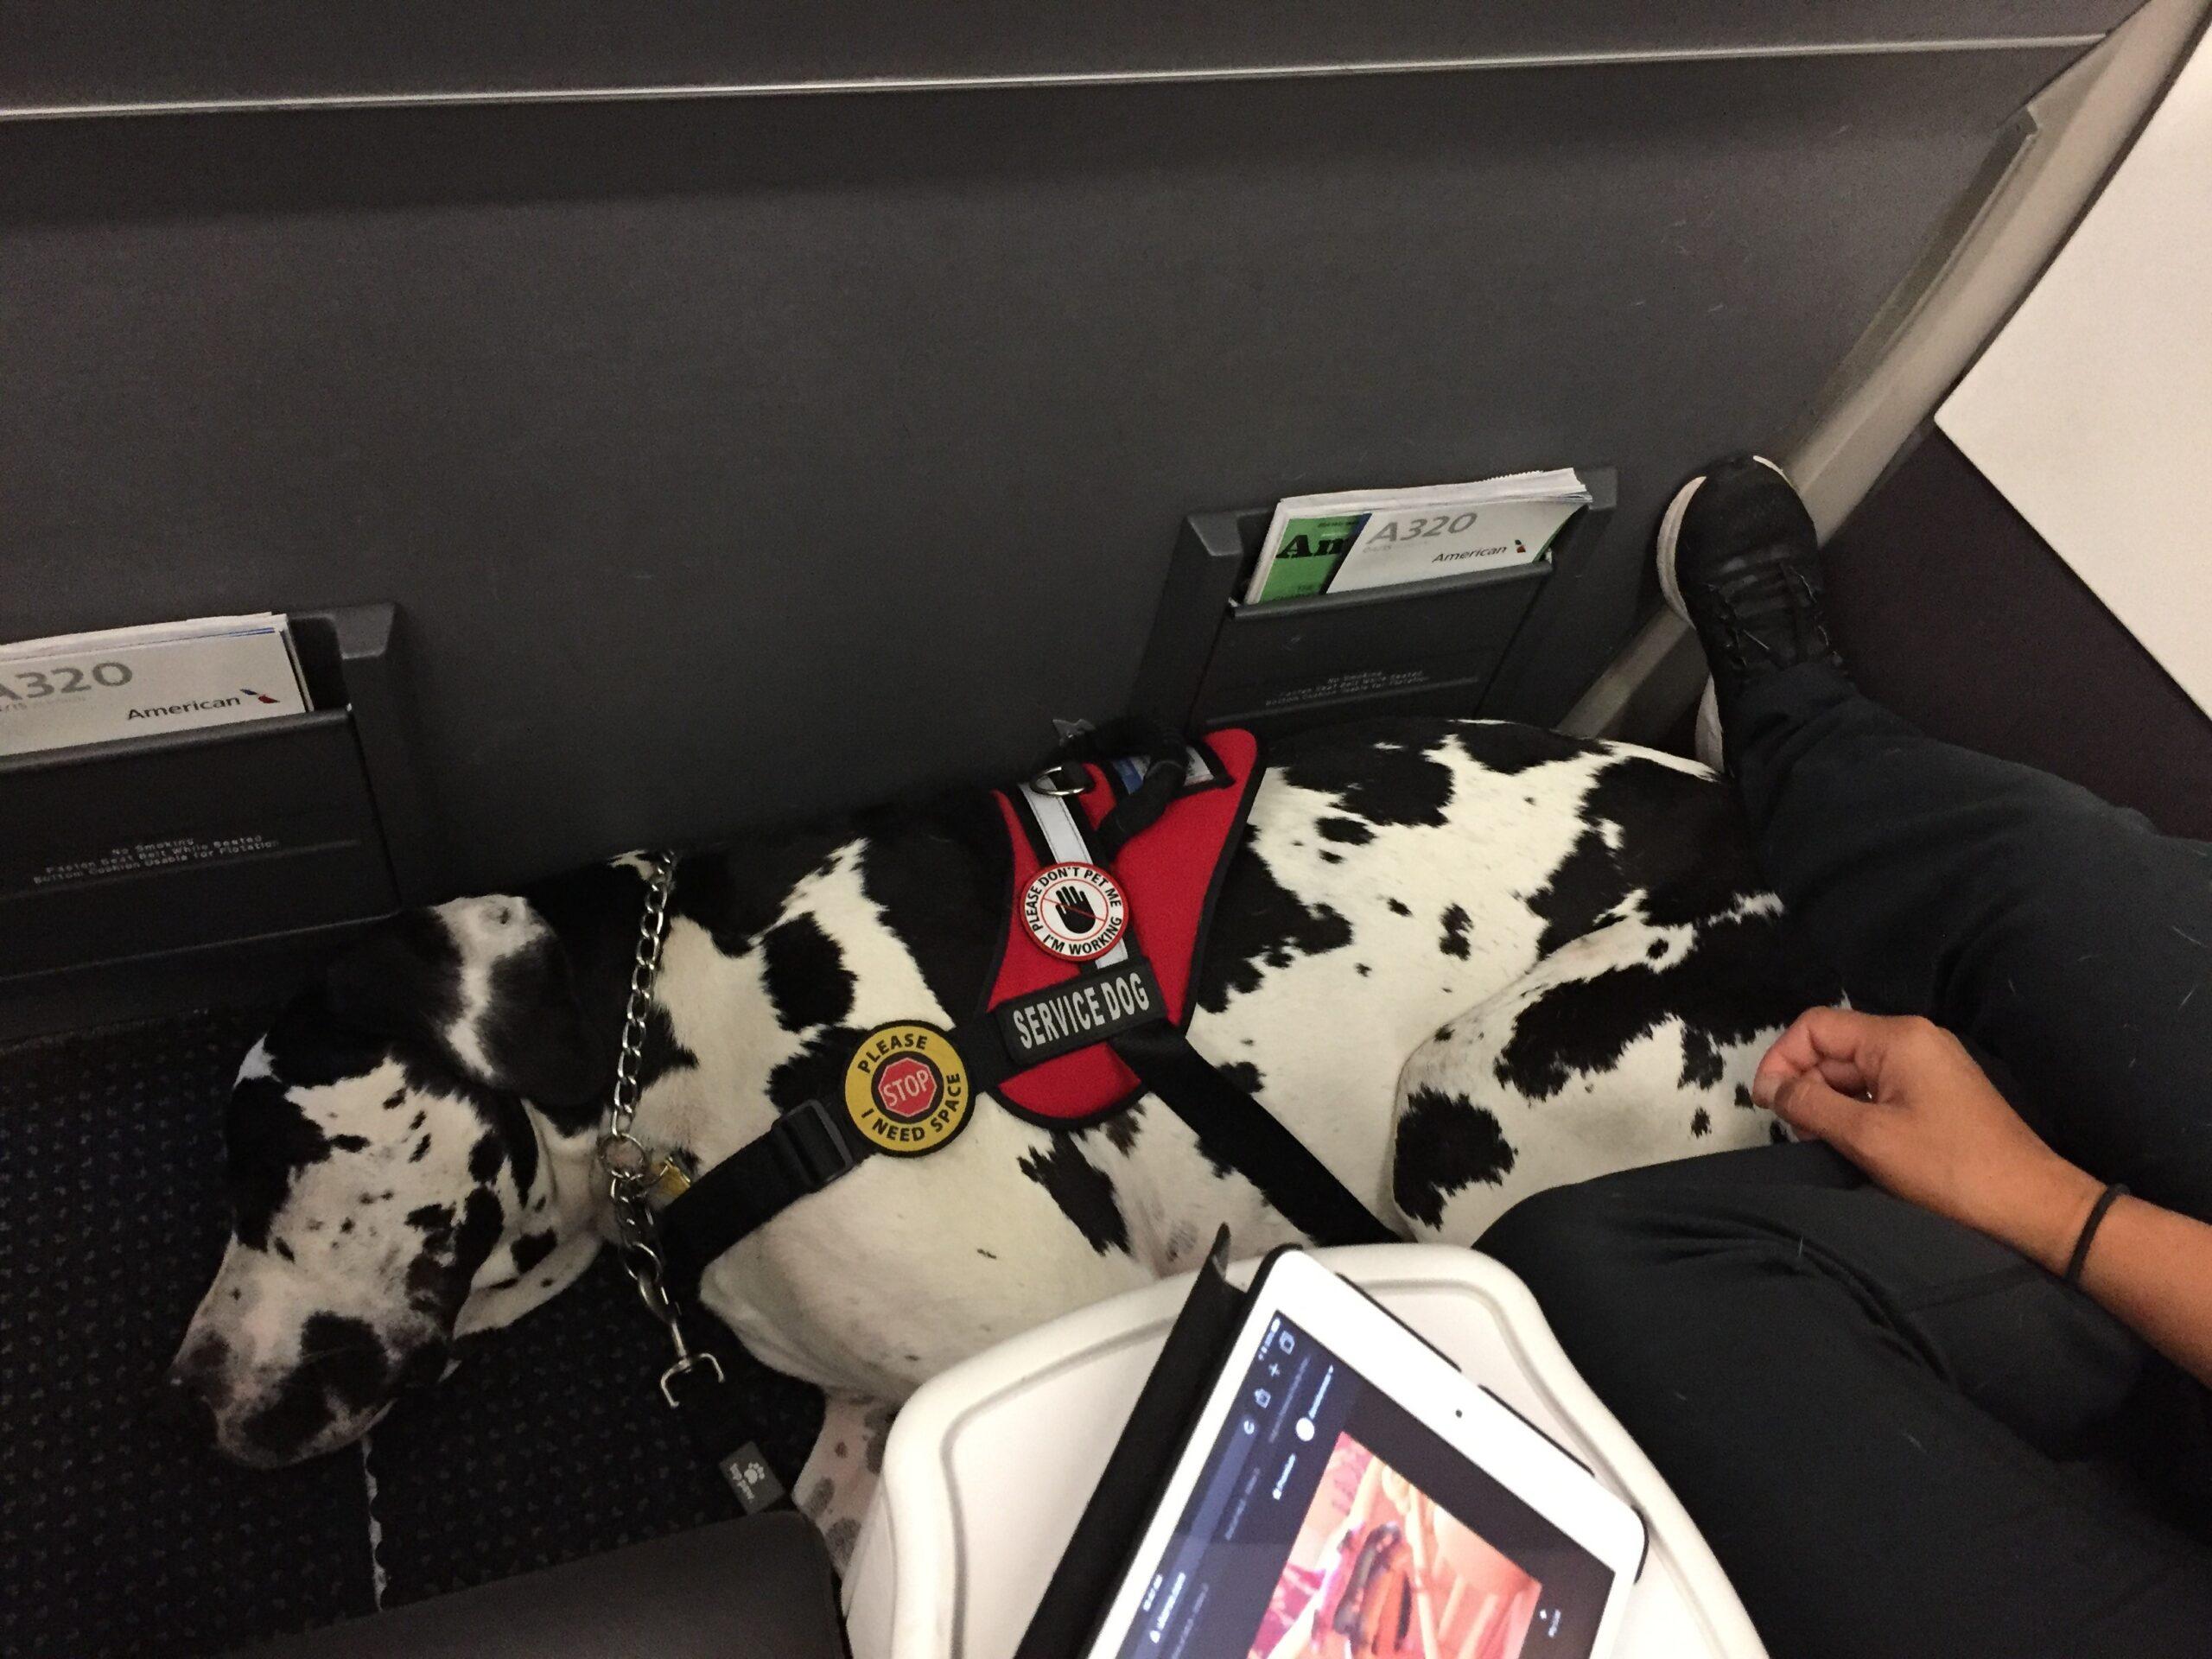 dog on airplane, service dog, travel with dog